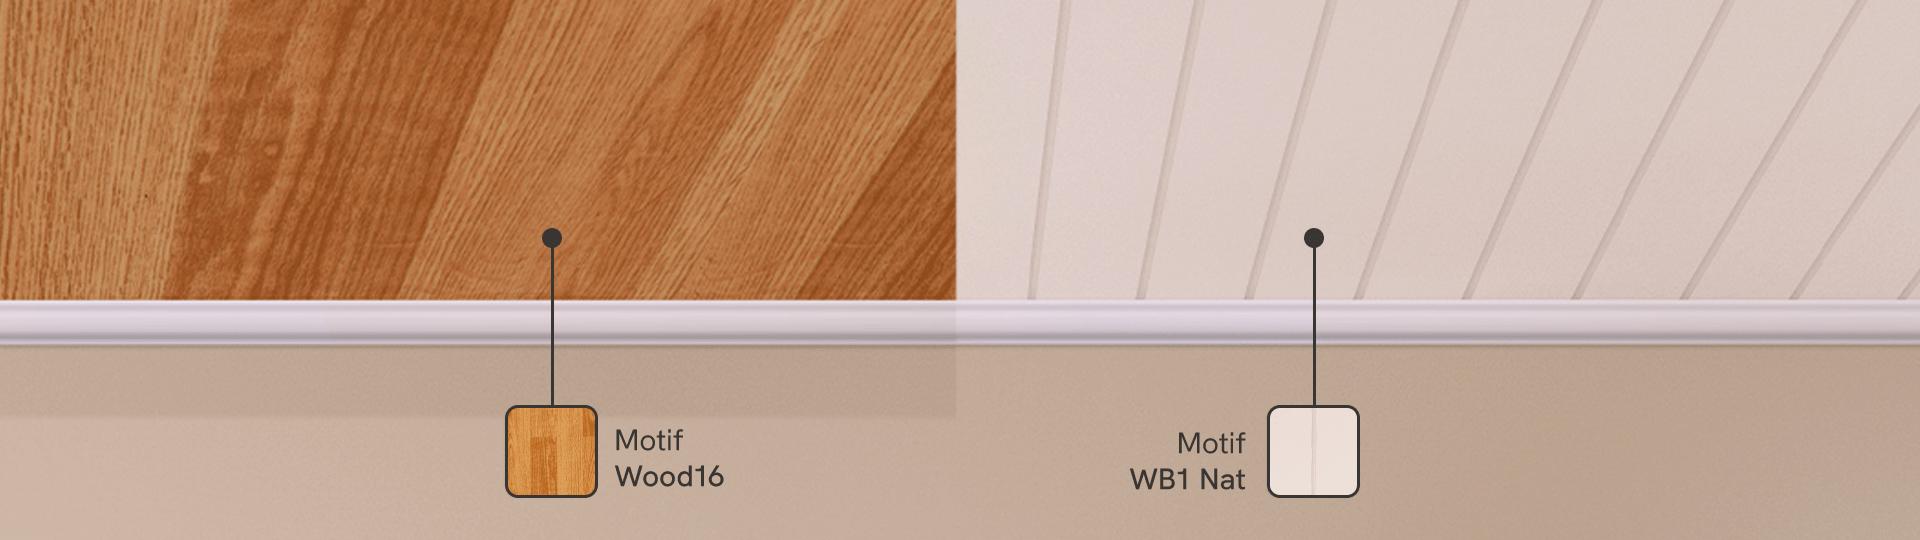 Plafon PVC Bringhome Kualitas Premium dan Exclusive